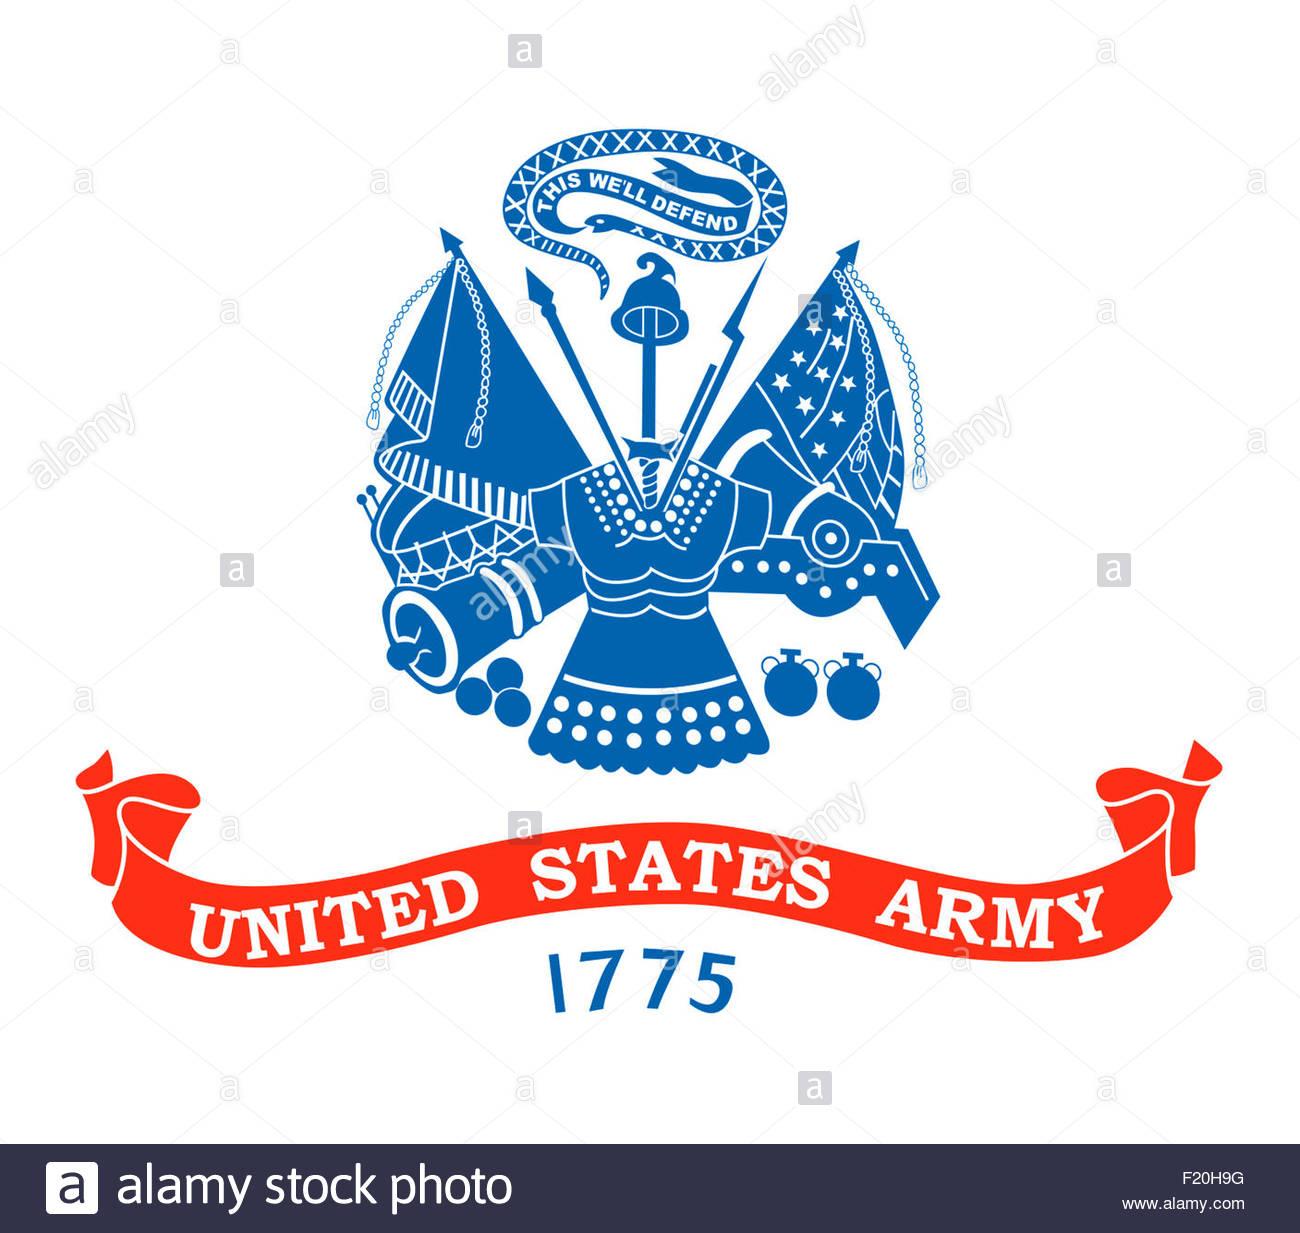 United States Army DA logo icon - Stock Image